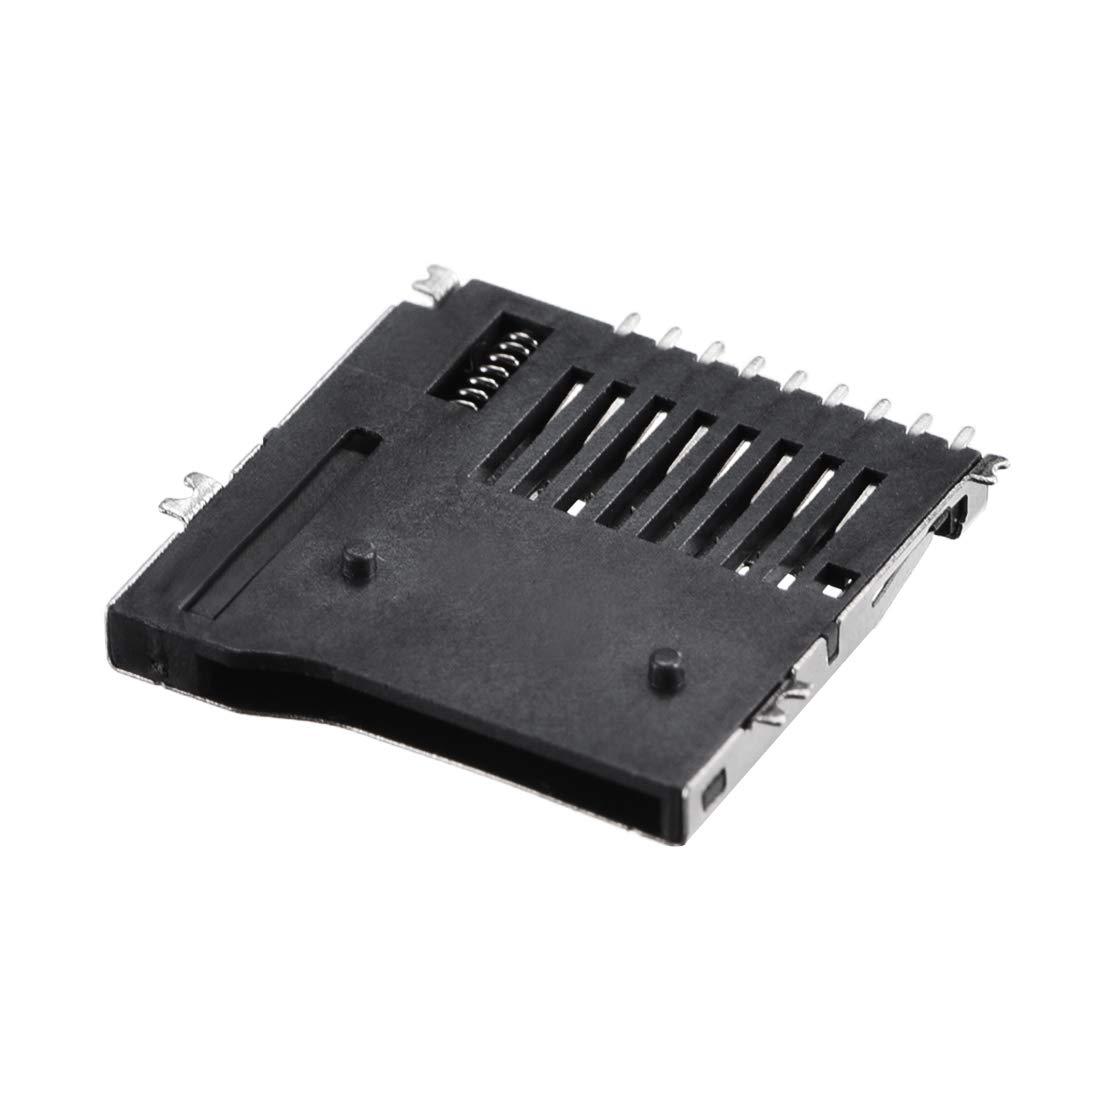 Card Socket Holder SMT SMD Push Type 9 Pin 5pcs uxcell Micro SD TF